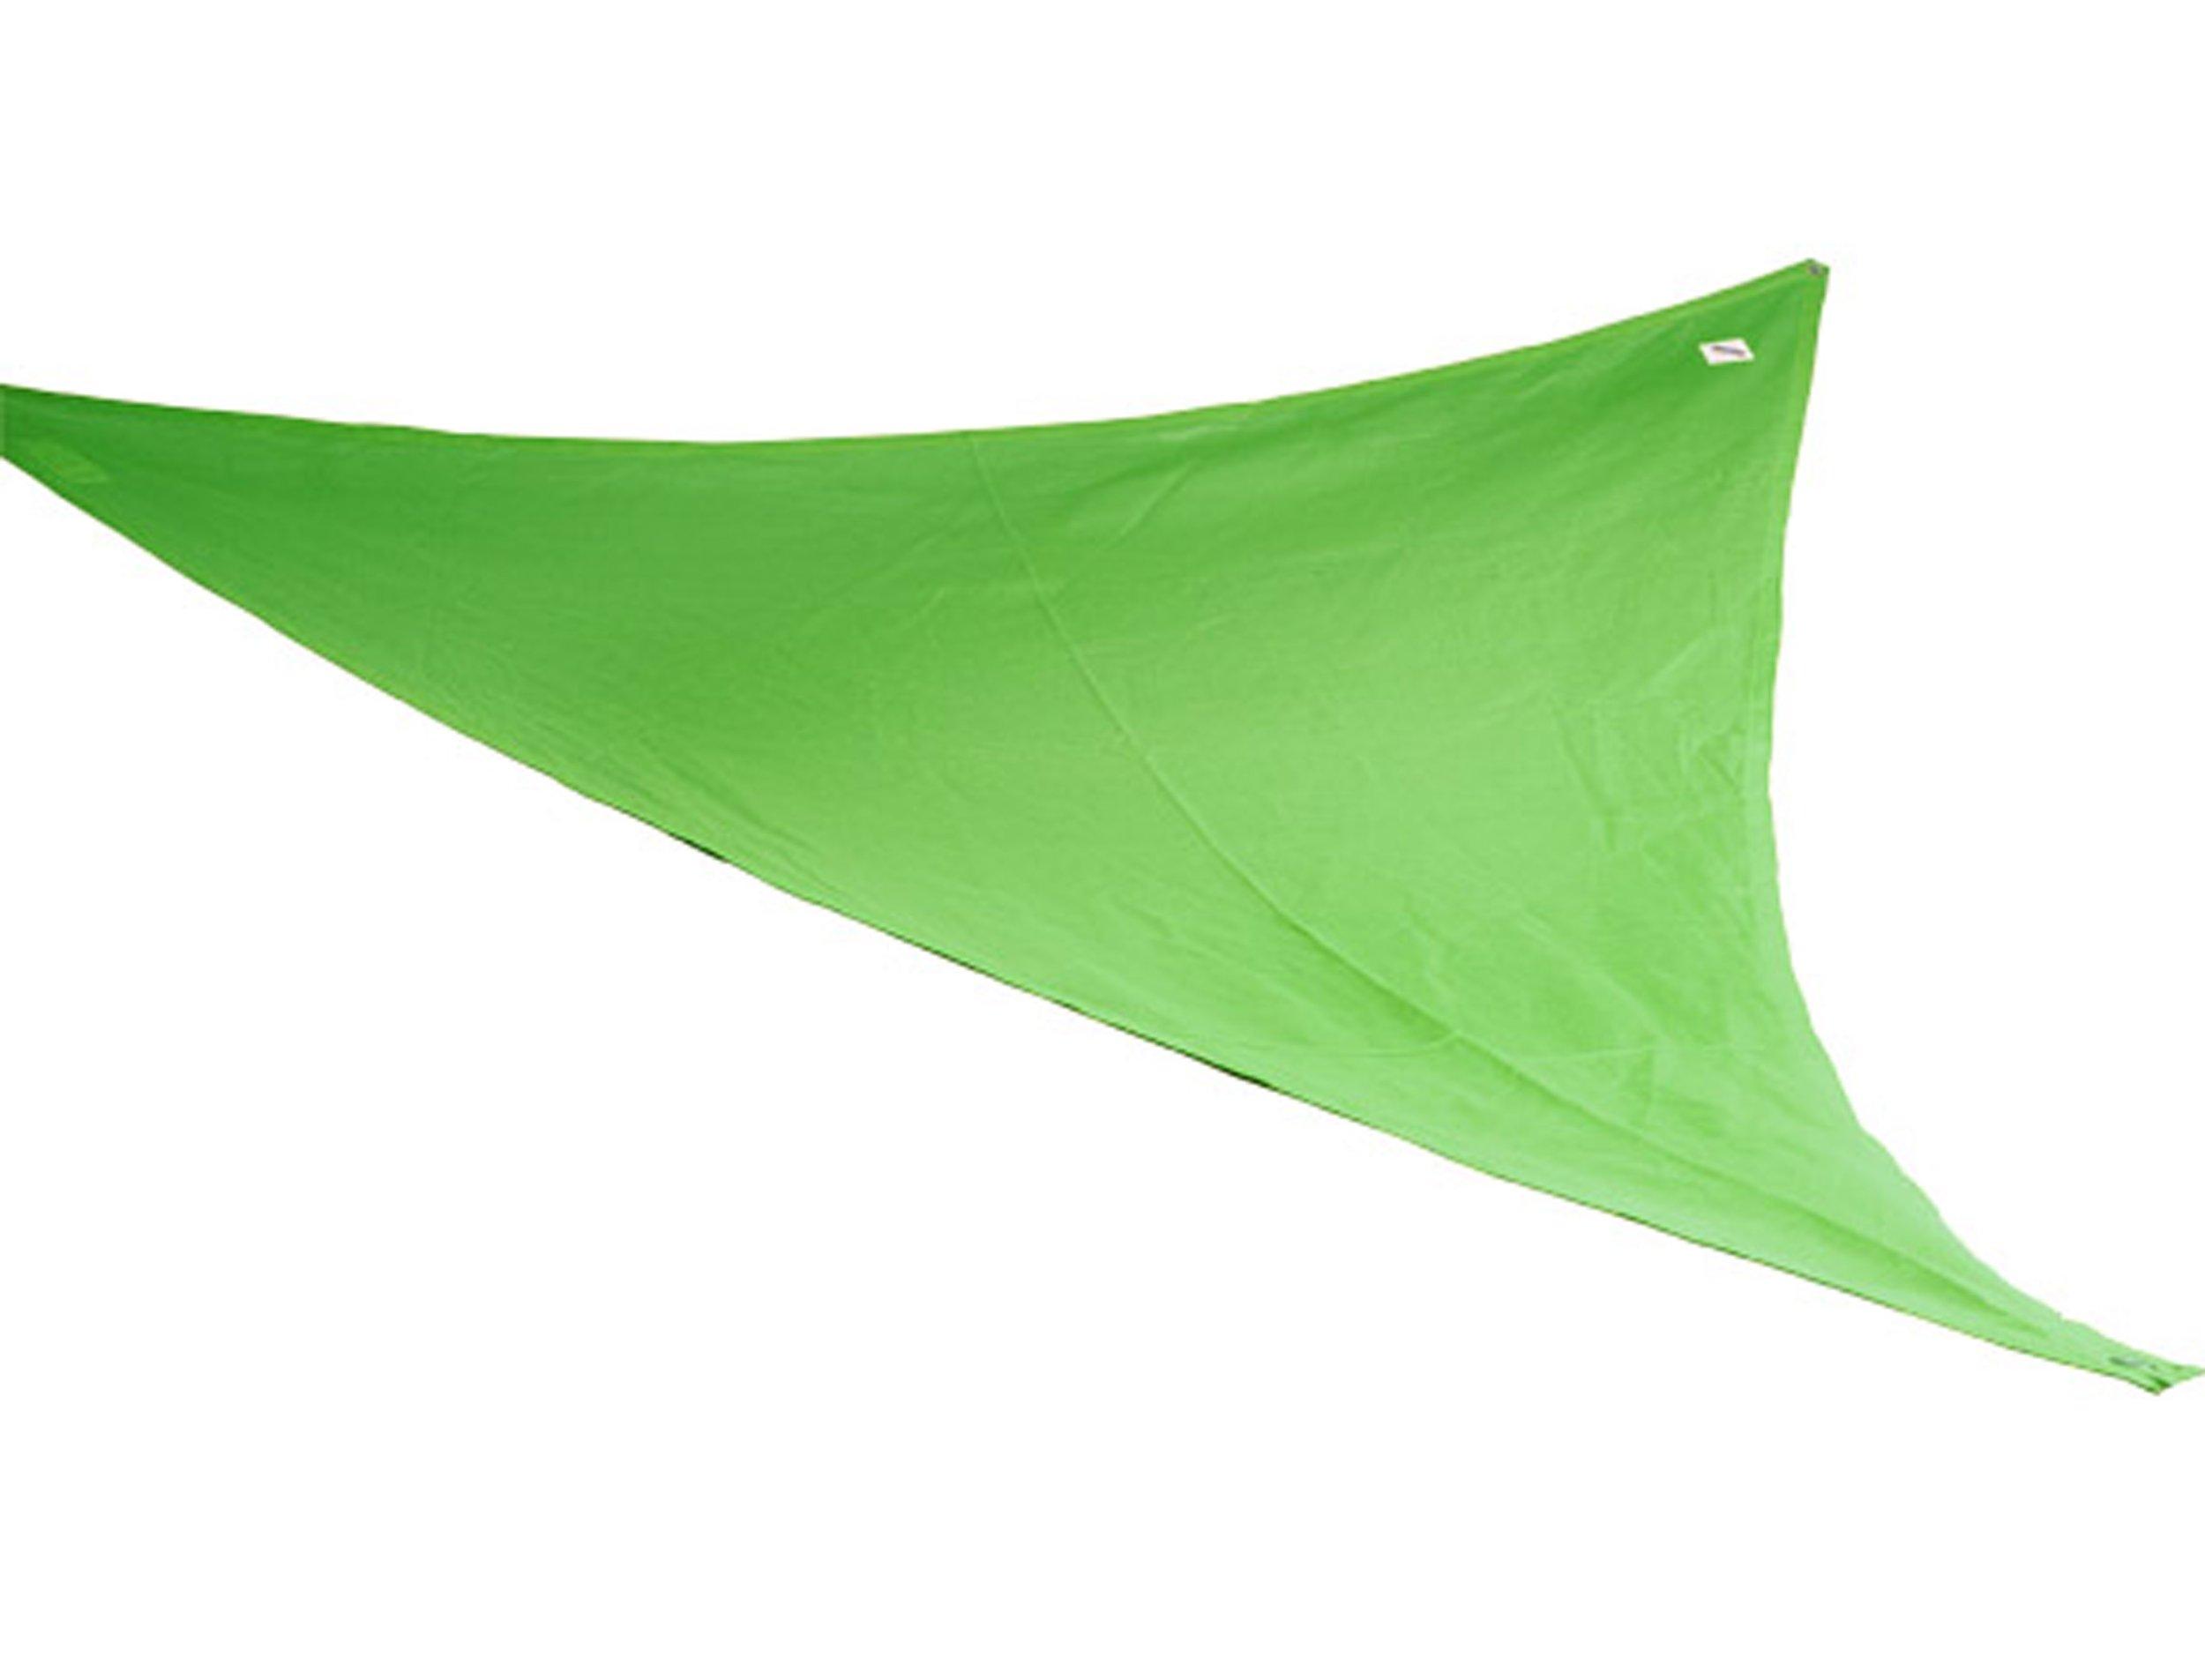 Coolaroo Kool Kolors Party Sail 9 Feet 10 Inch Triangle - Green